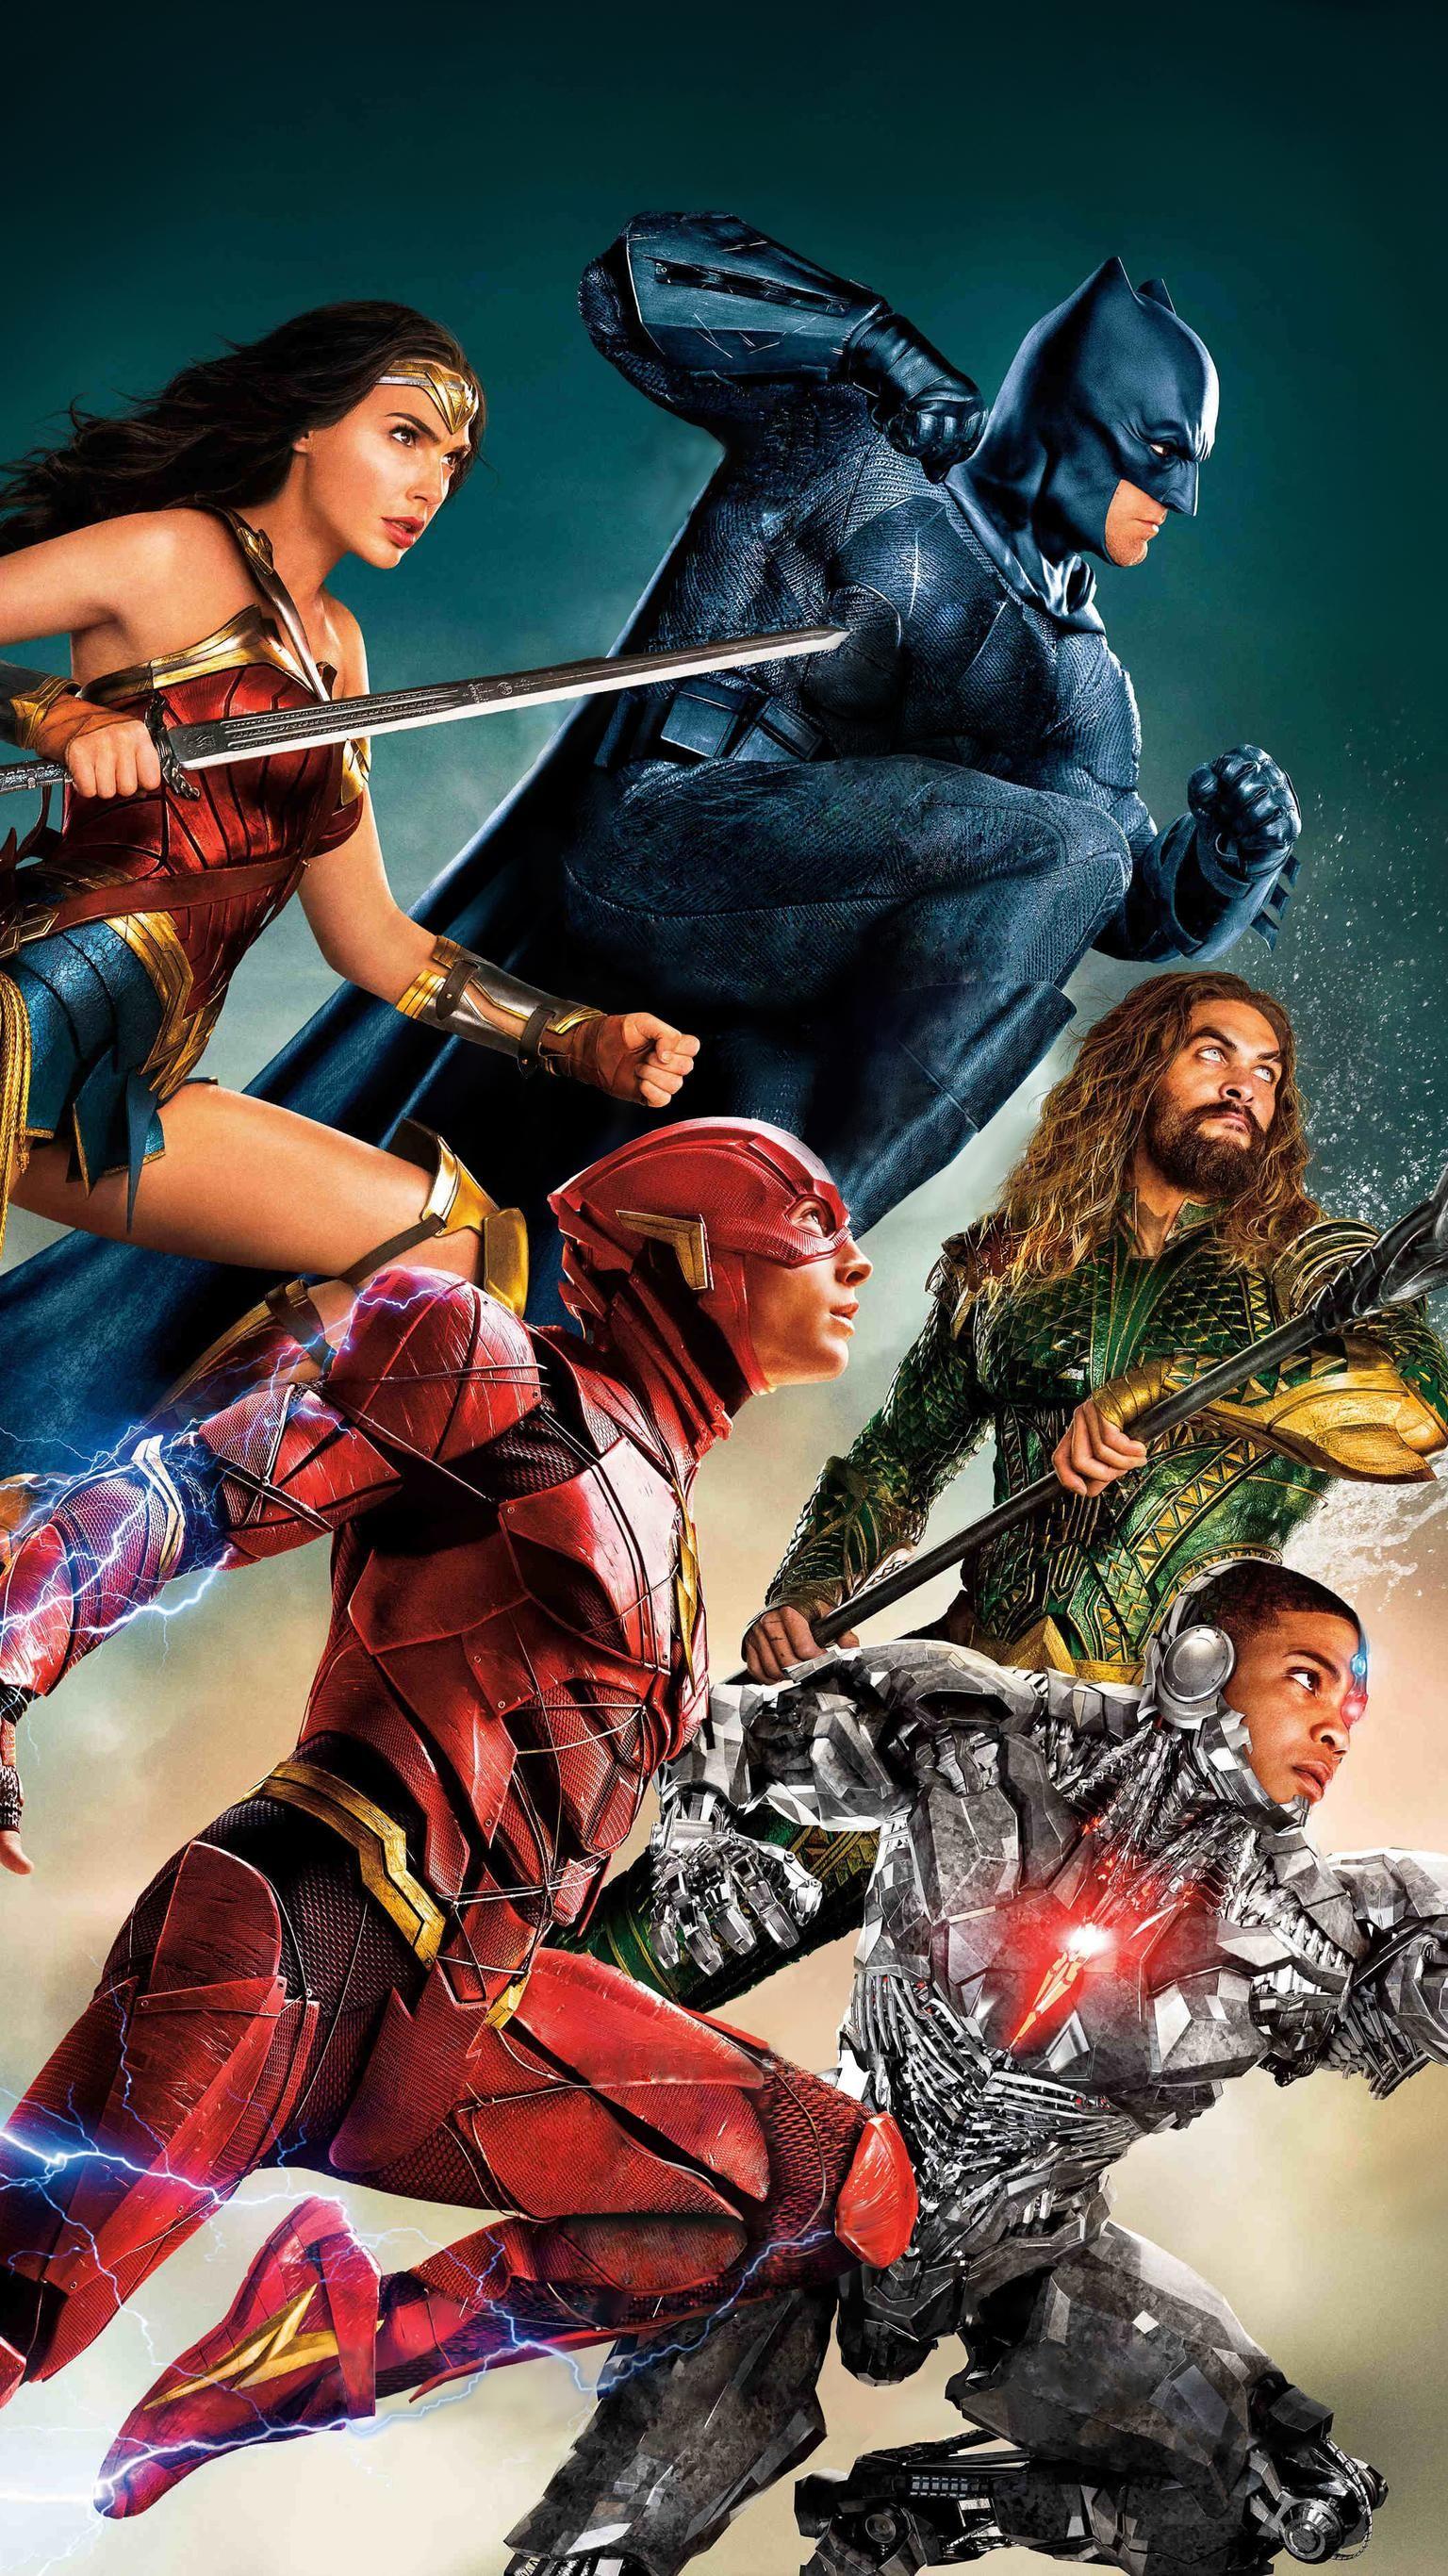 Justice league 2017 phone wallpaper moviemania dc